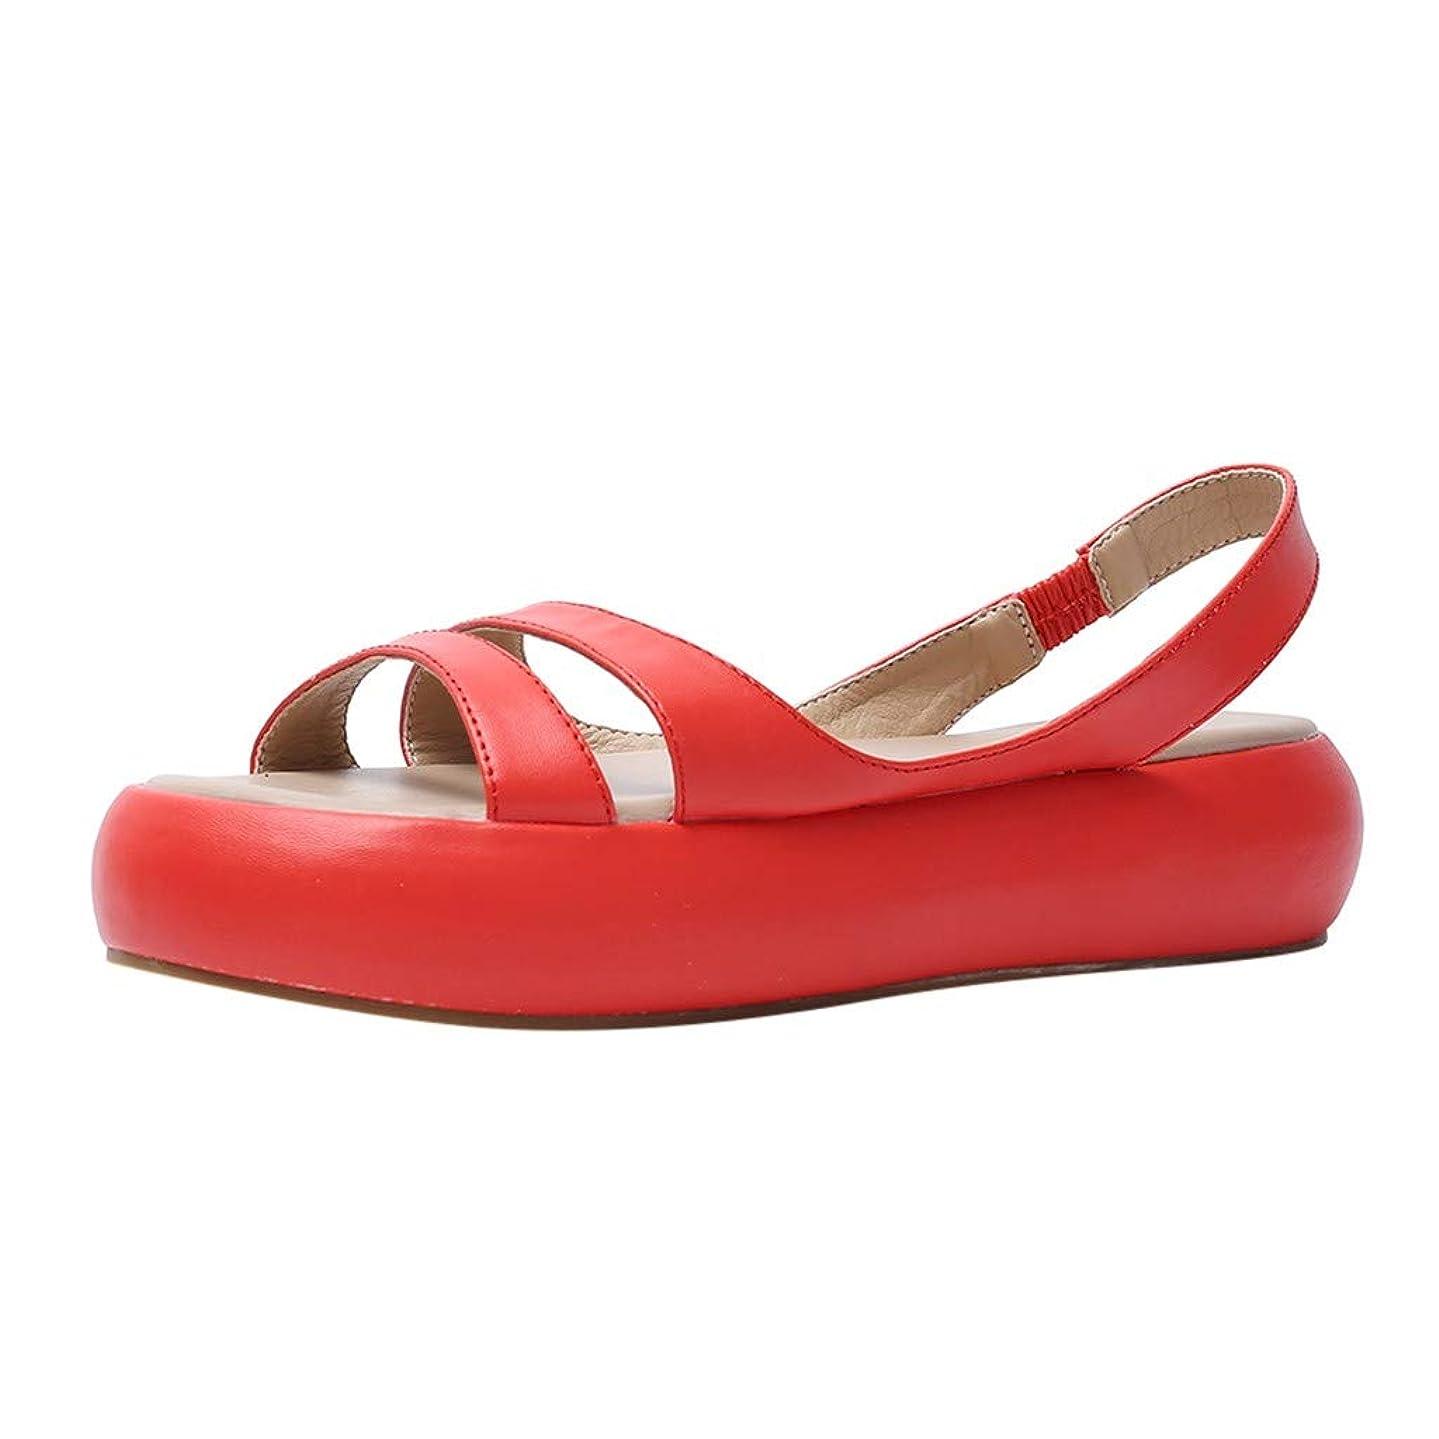 ??NEARTIME??Women's Beach Walk Shoes, Summer Casual Shoes Platform-Bottom Sandals Slip-On Basic Shoes